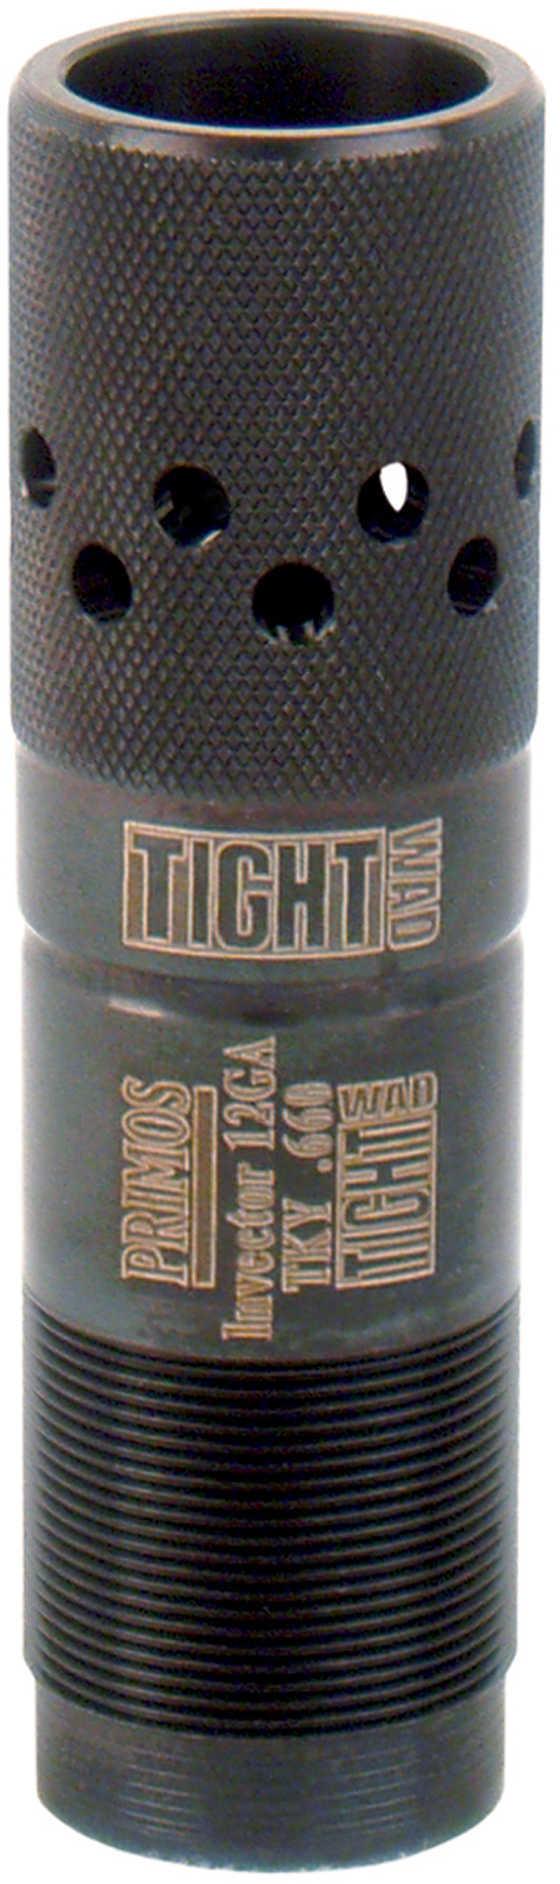 Primos Tightwad Choke Tube 12 Gauge Turkey, .660 Invector Md: 6774